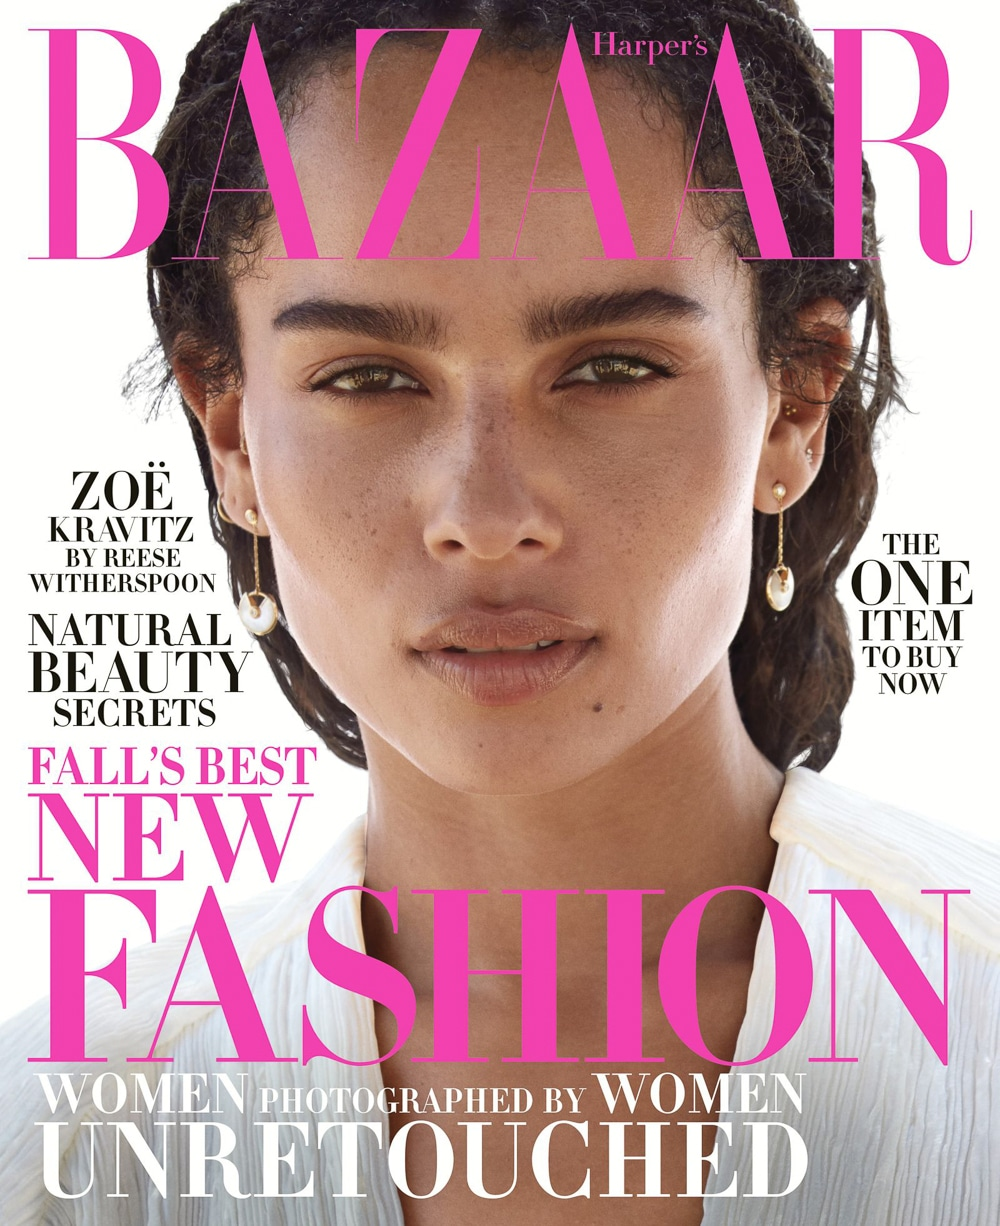 Harpers-Bazaar-Zoe-Kravitz-Camilla-Akrans-1.jpg